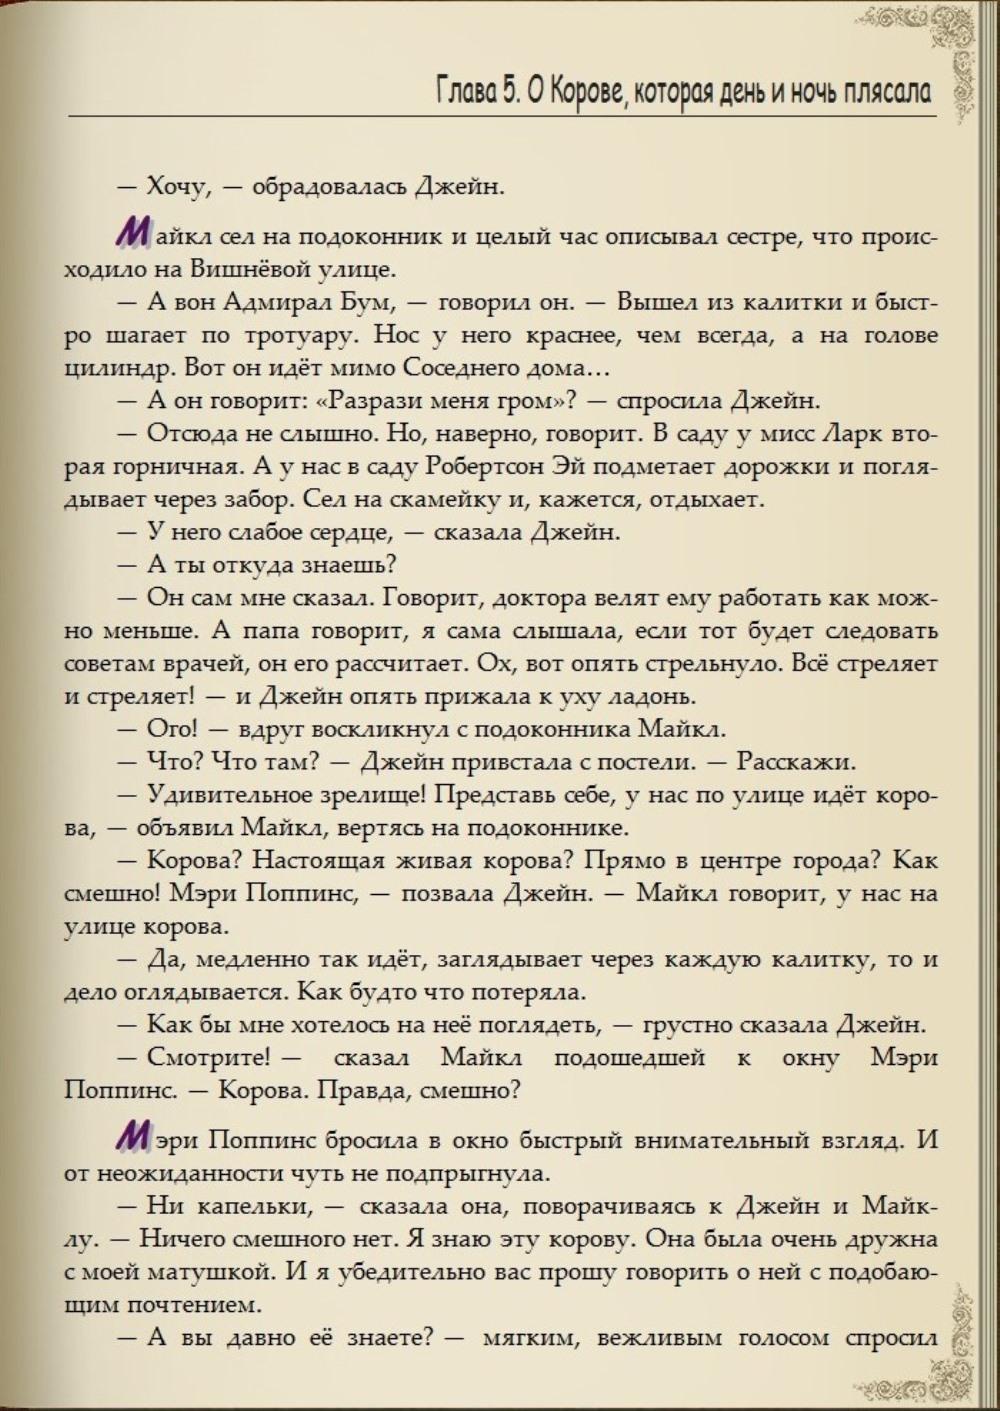 http://i4.imageban.ru/out/2013/11/13/17ff0c3a7595eedd478d726c163269c8.jpg